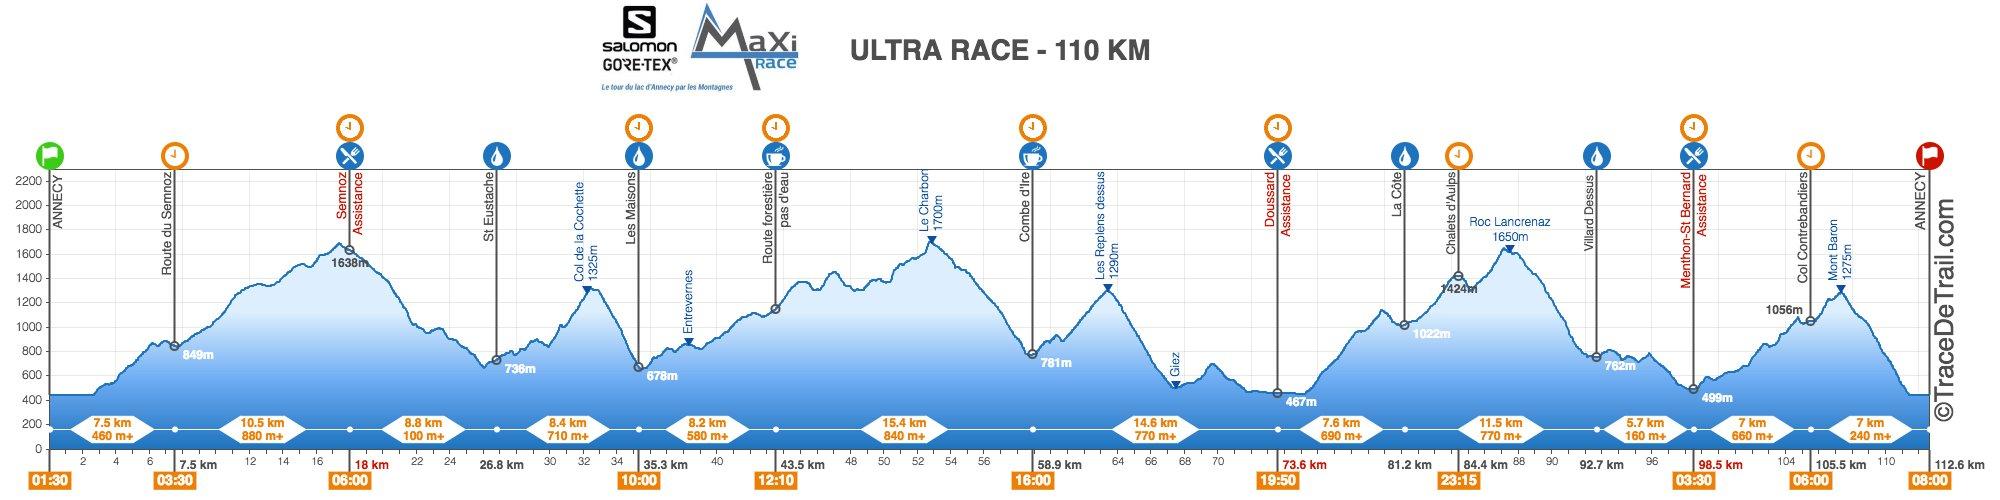 profil_ultrarace2017